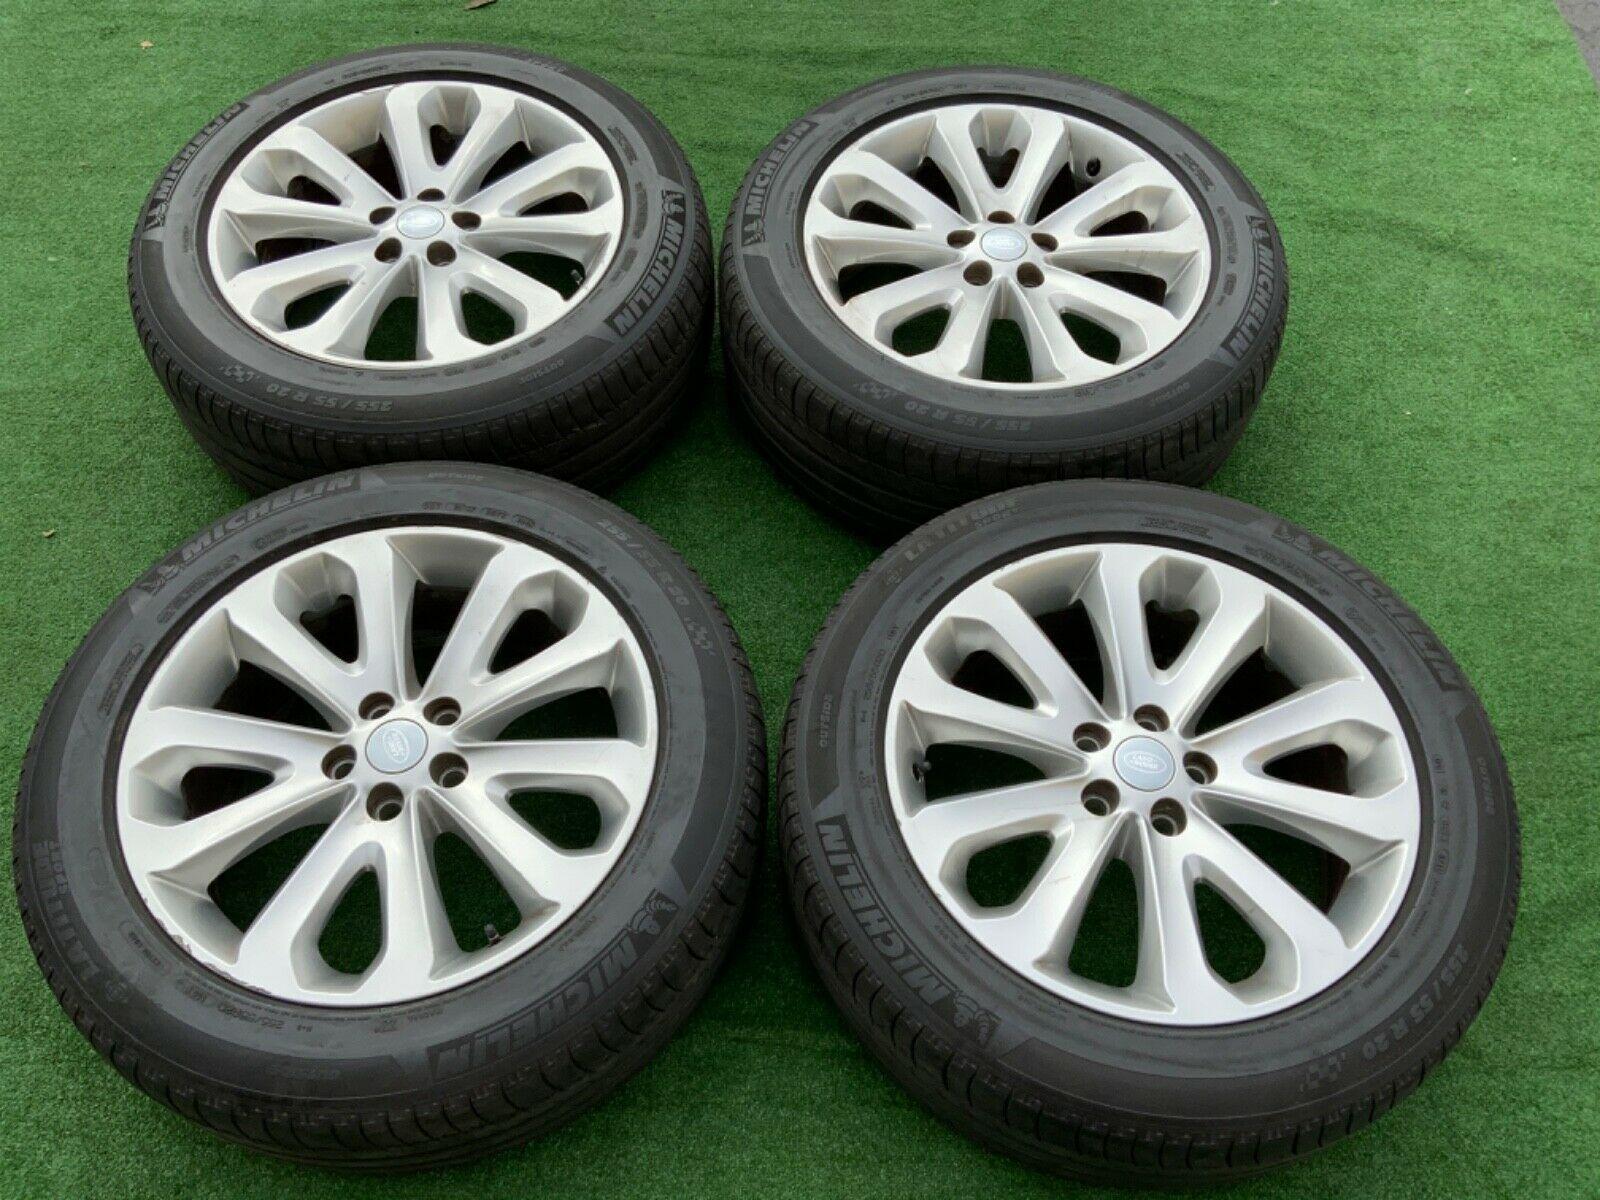 20 Inch Range Rover Wheels In 2021 Range Rover Wheels Range Rover Range Rover Black